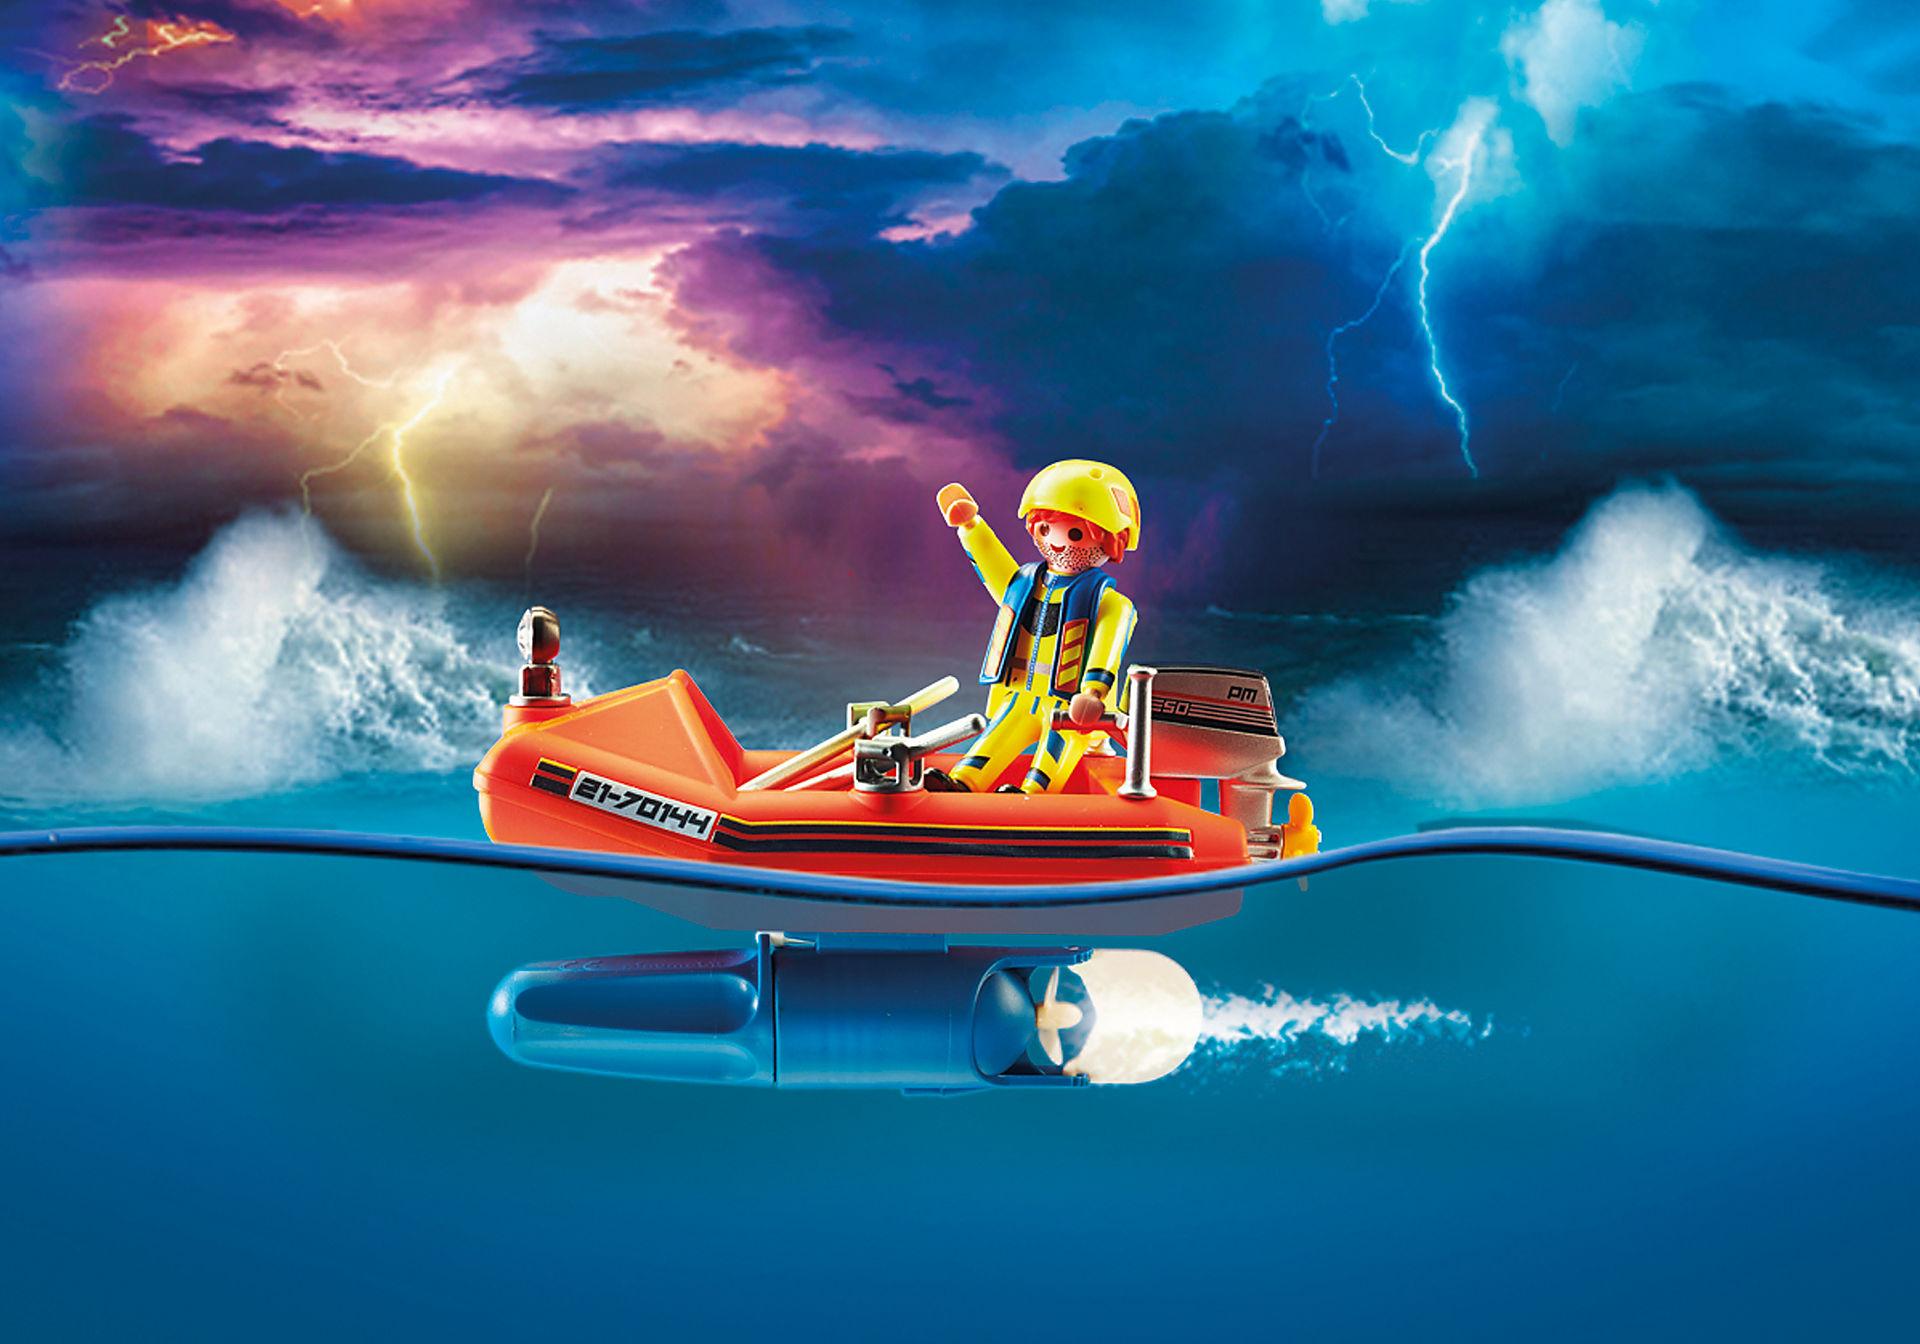 70144 Kitesurfer Rescue with Speedboat zoom image4